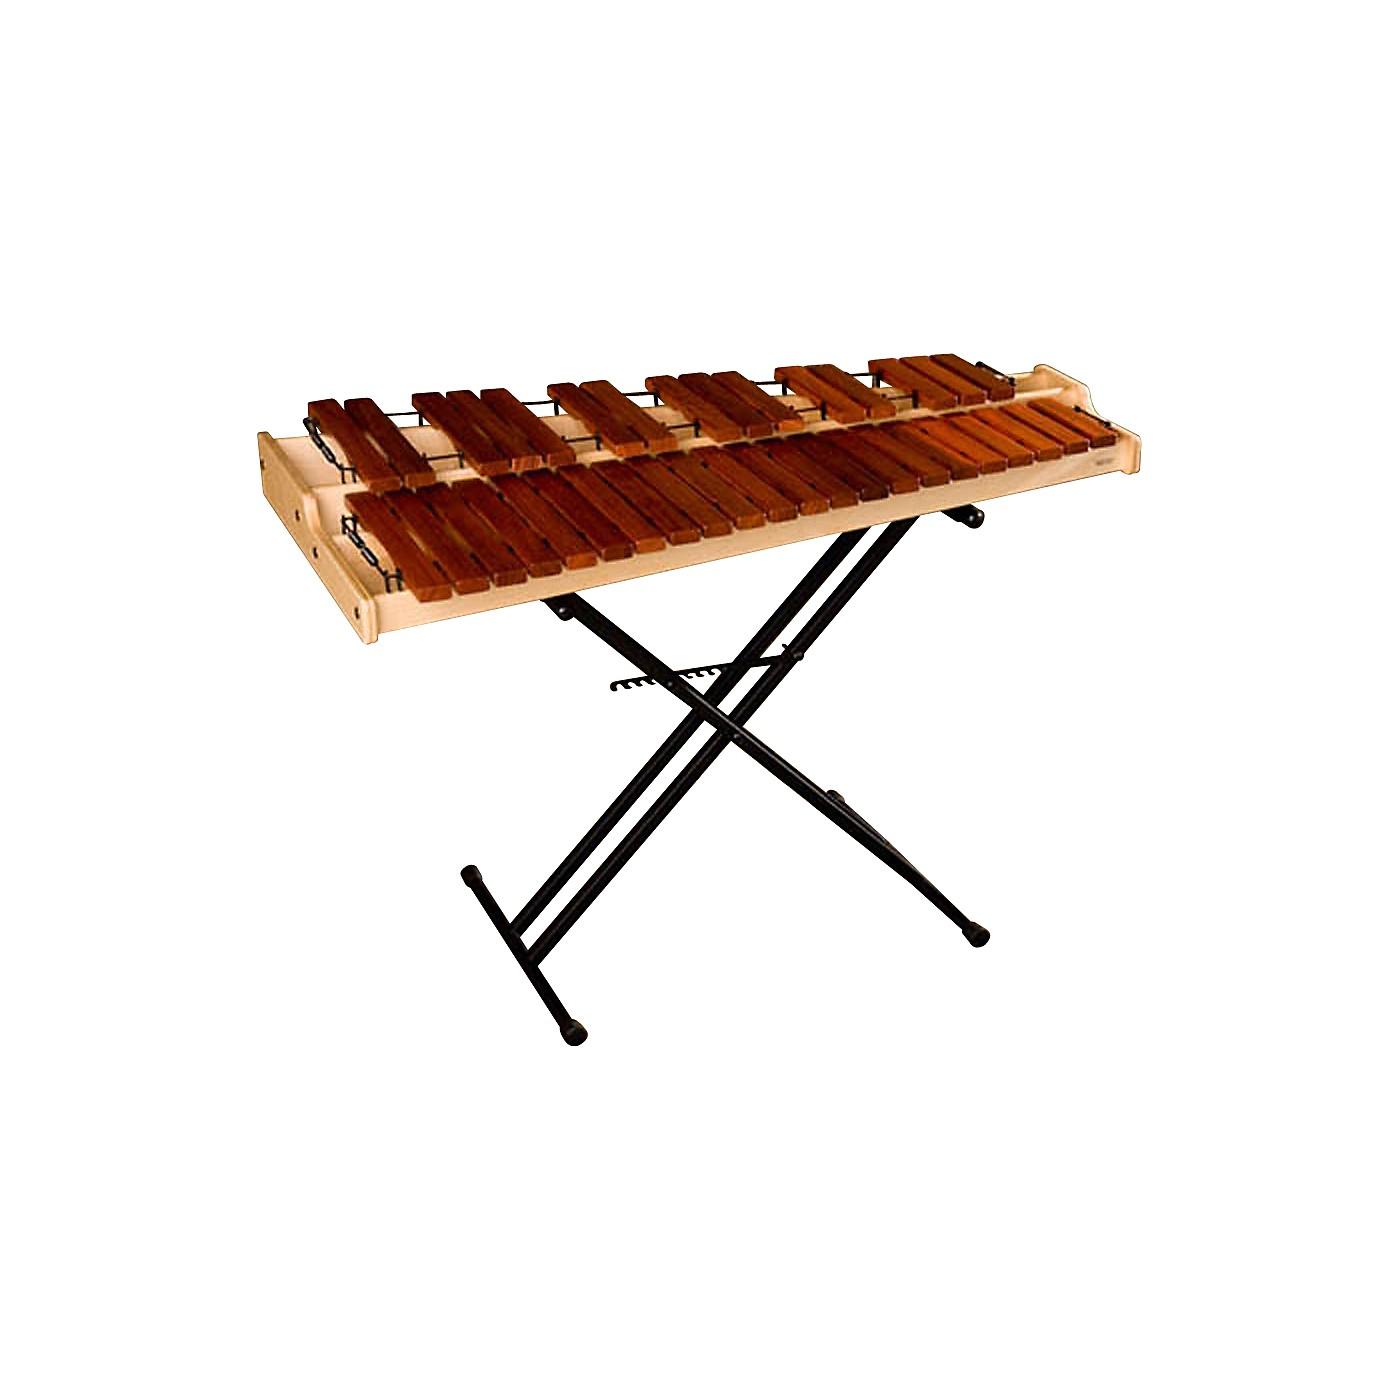 Marimba Warehouse MPM Maxey 3-Octave Practice Marimba with Stand thumbnail